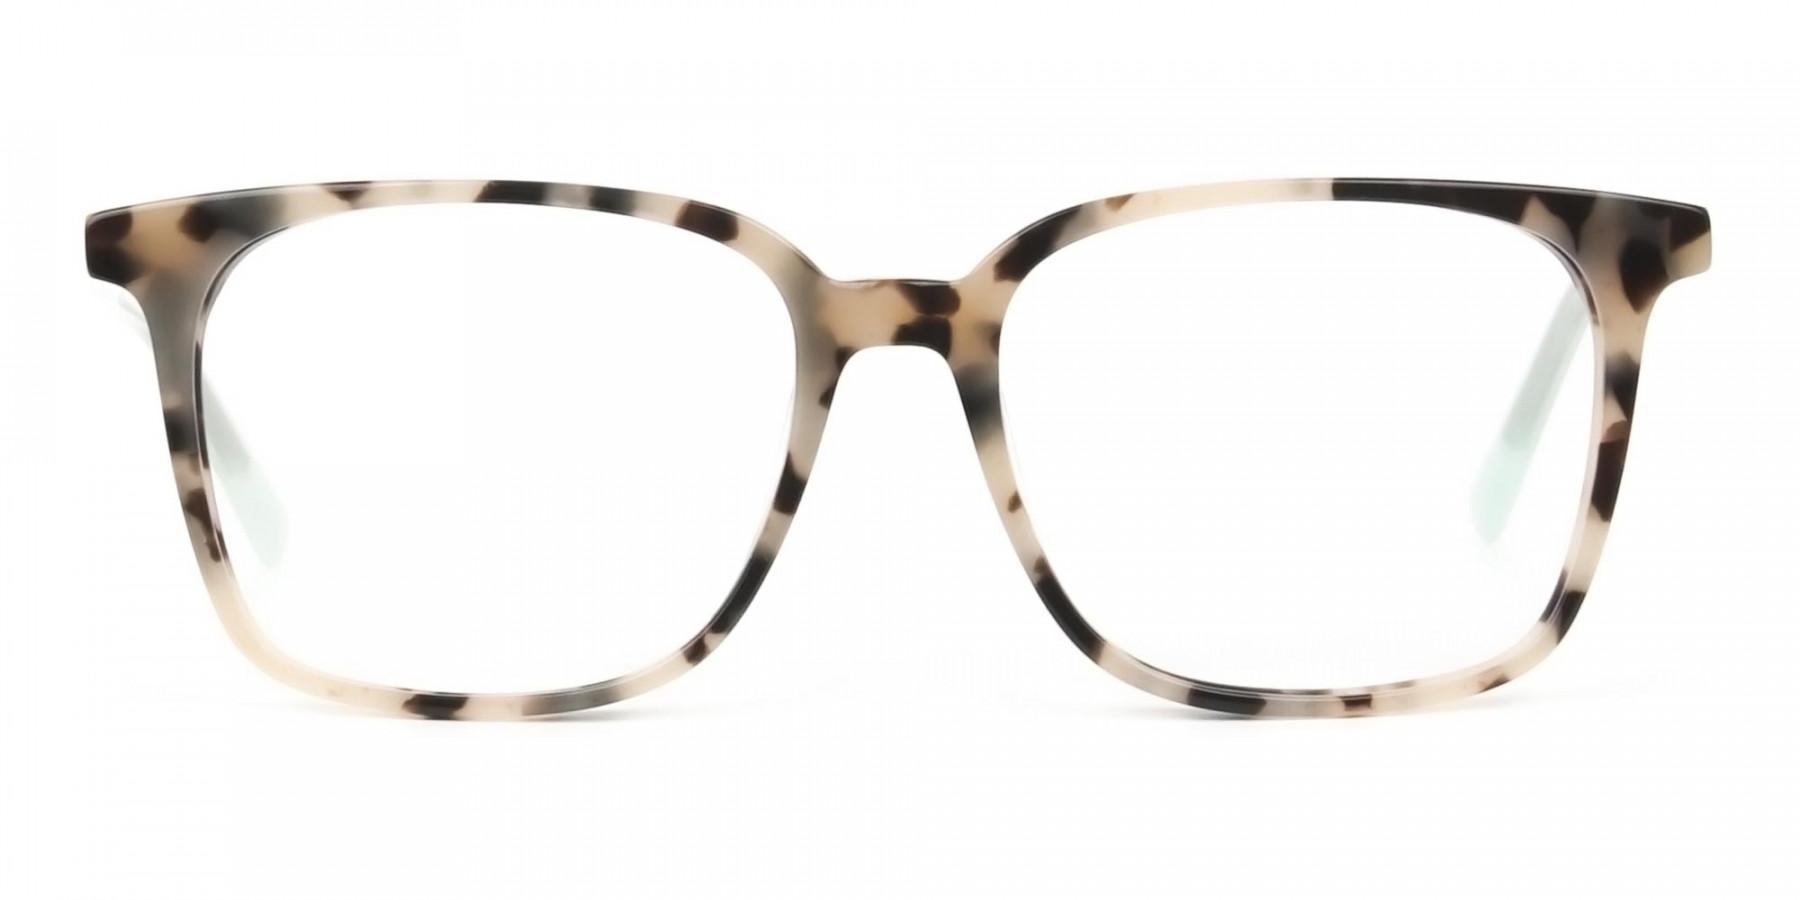 Crystal Teal Green Creamy Tortoise Glasses - 1